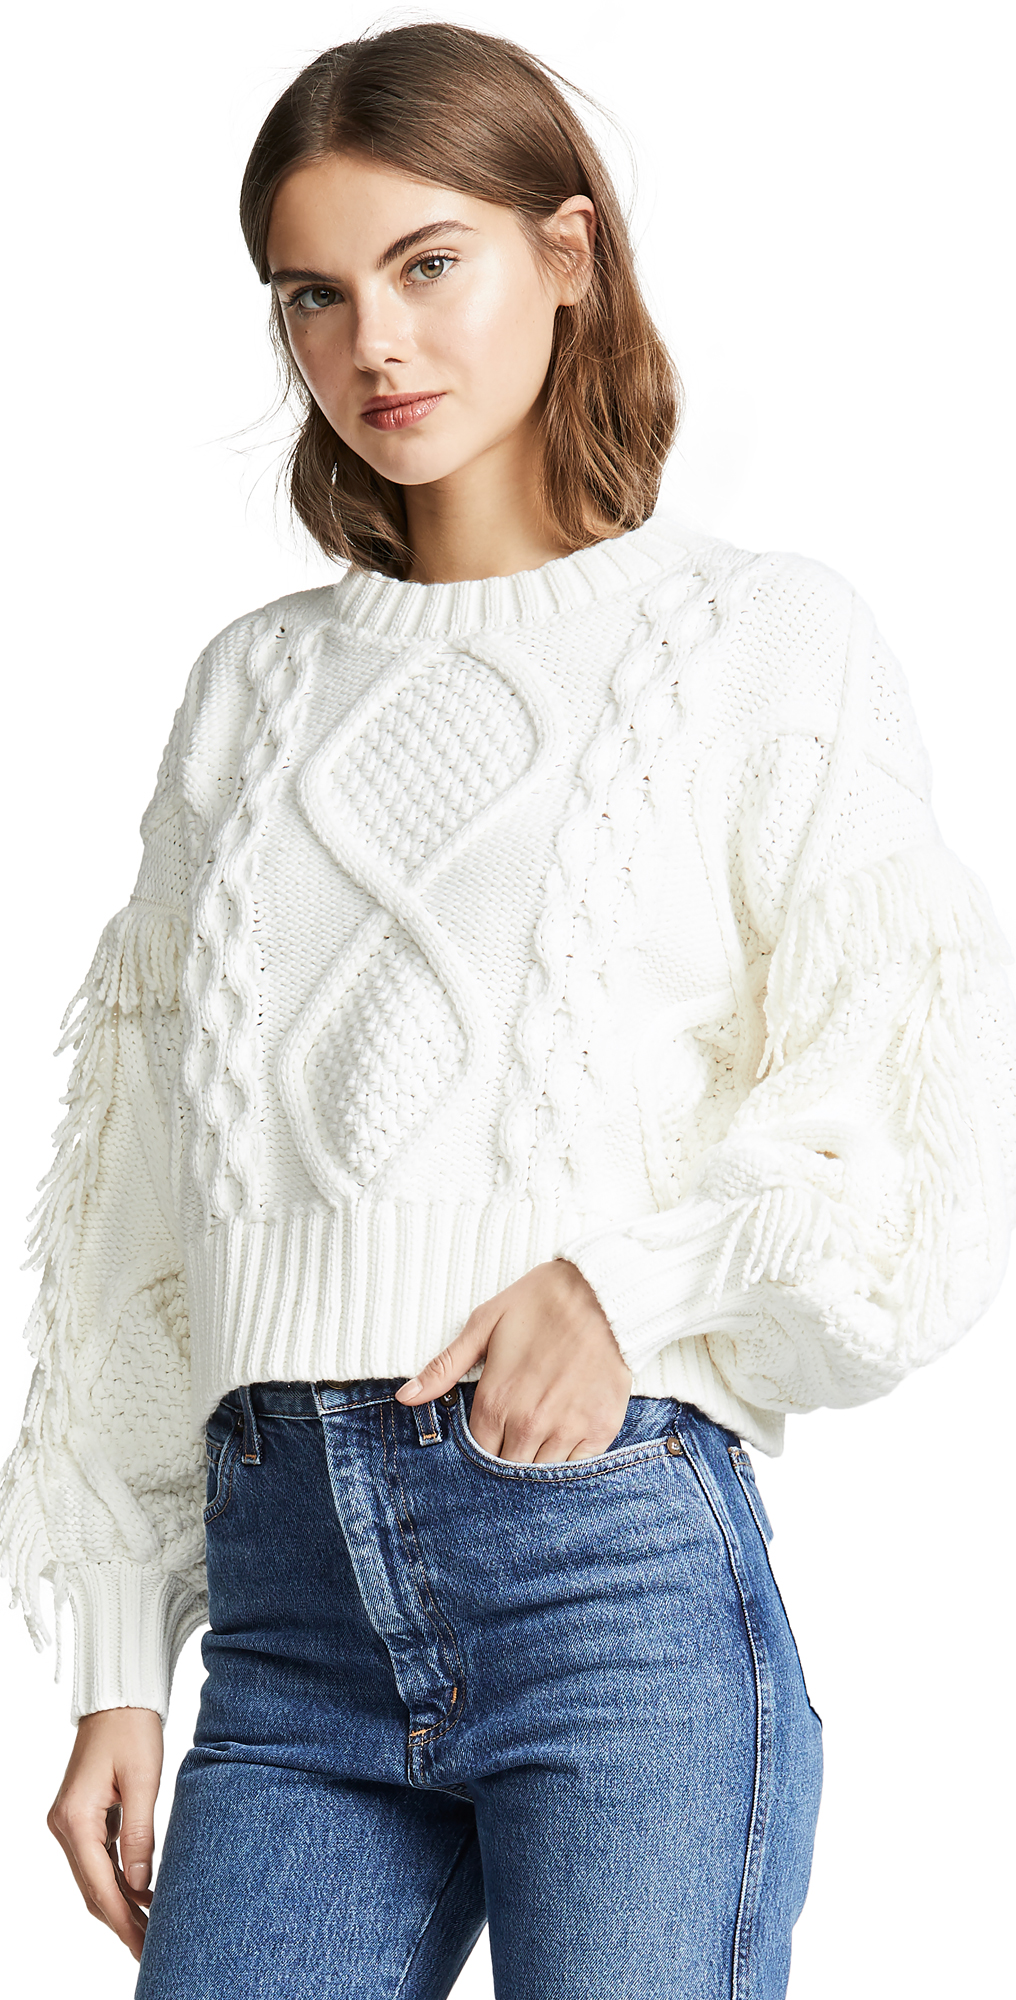 Jasper Fringe Cable Knit Sweater